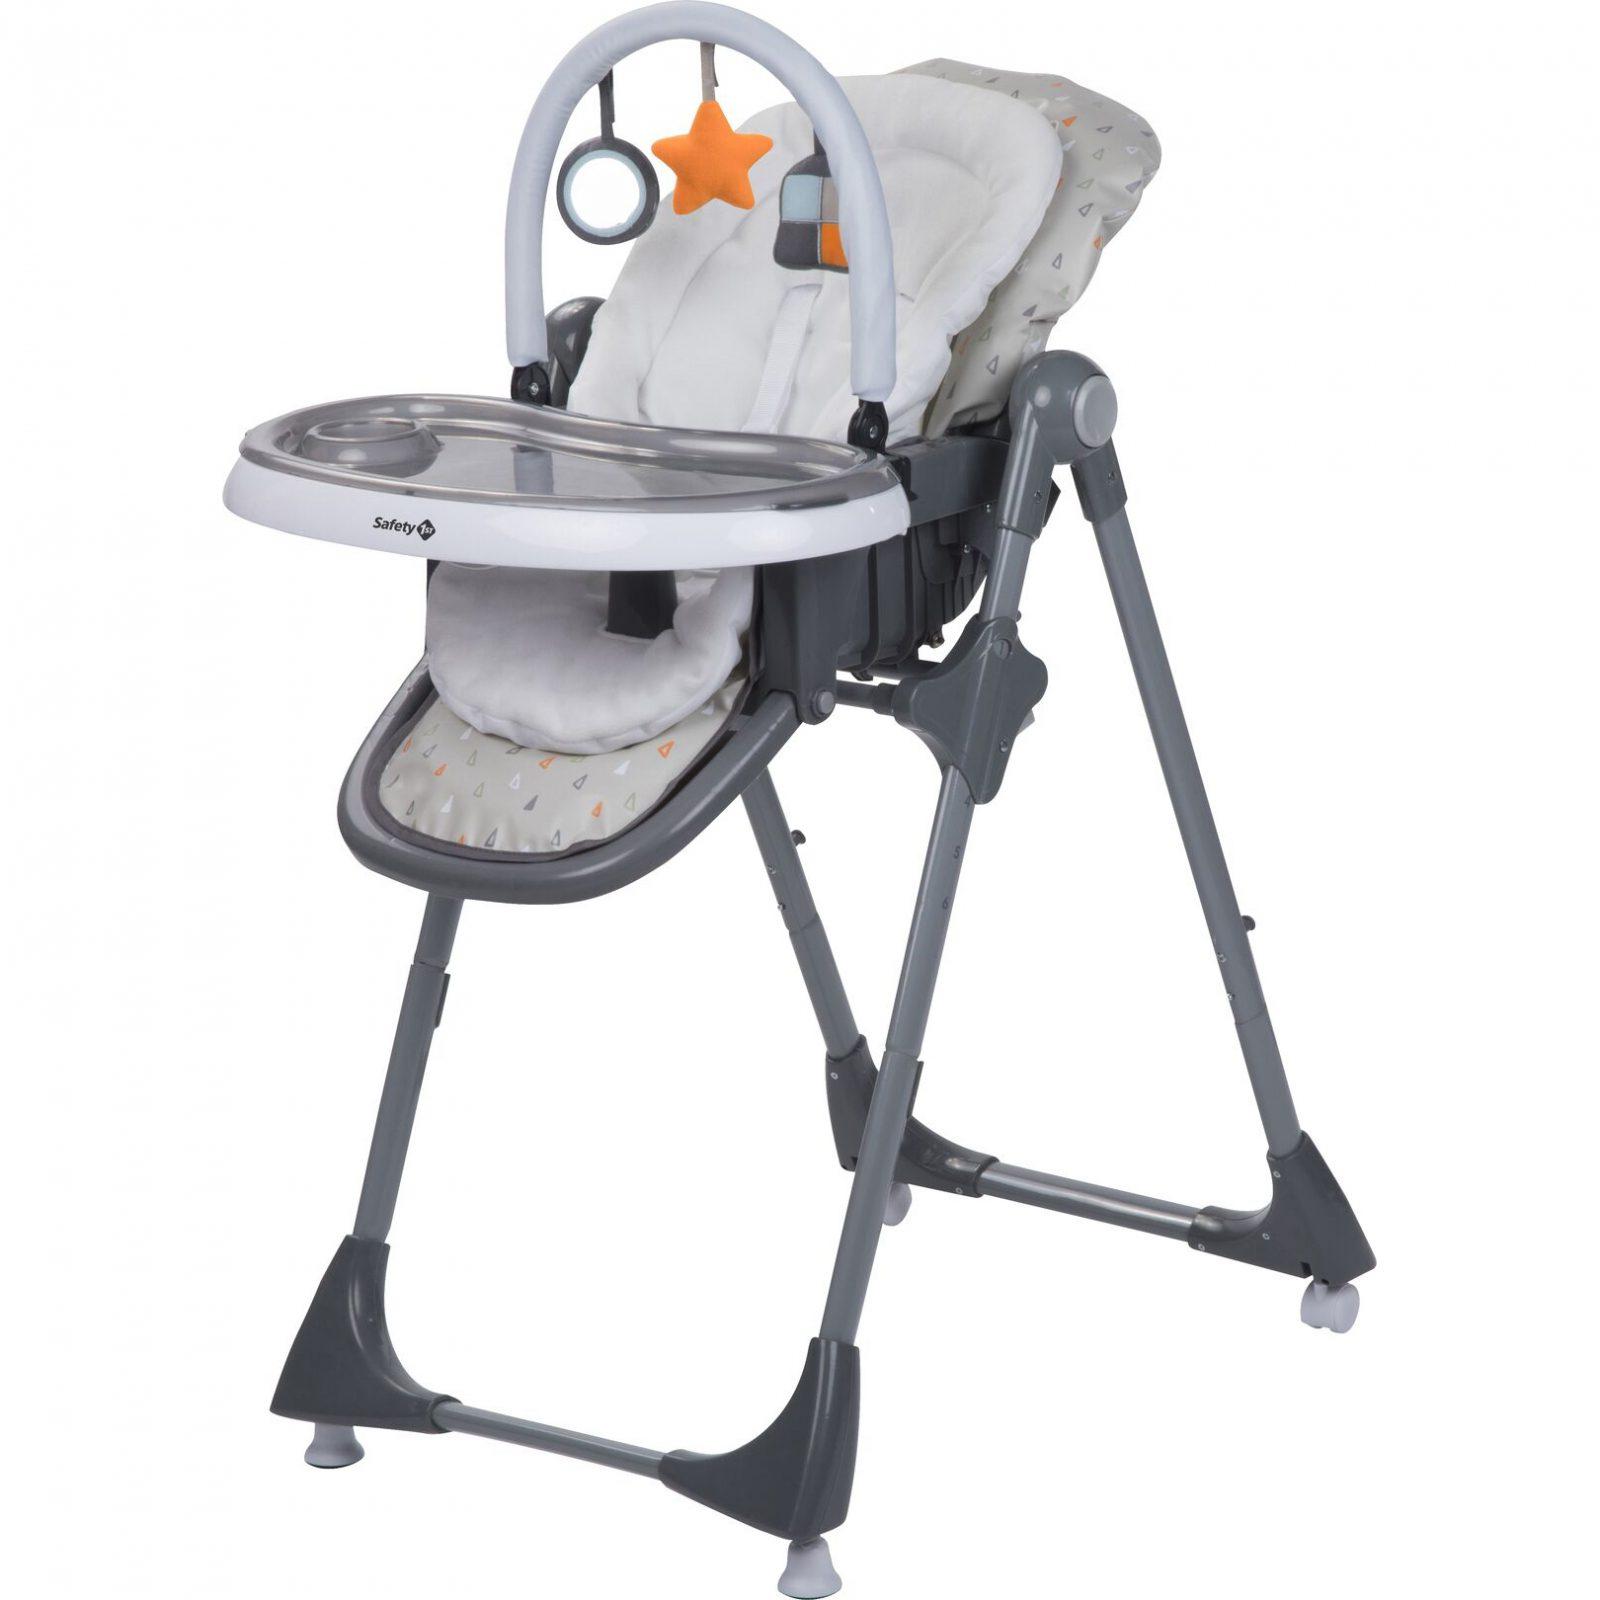 Baby In Kinderstoel.Safety 1st Kiwi 3 In 1 Kinderstoel